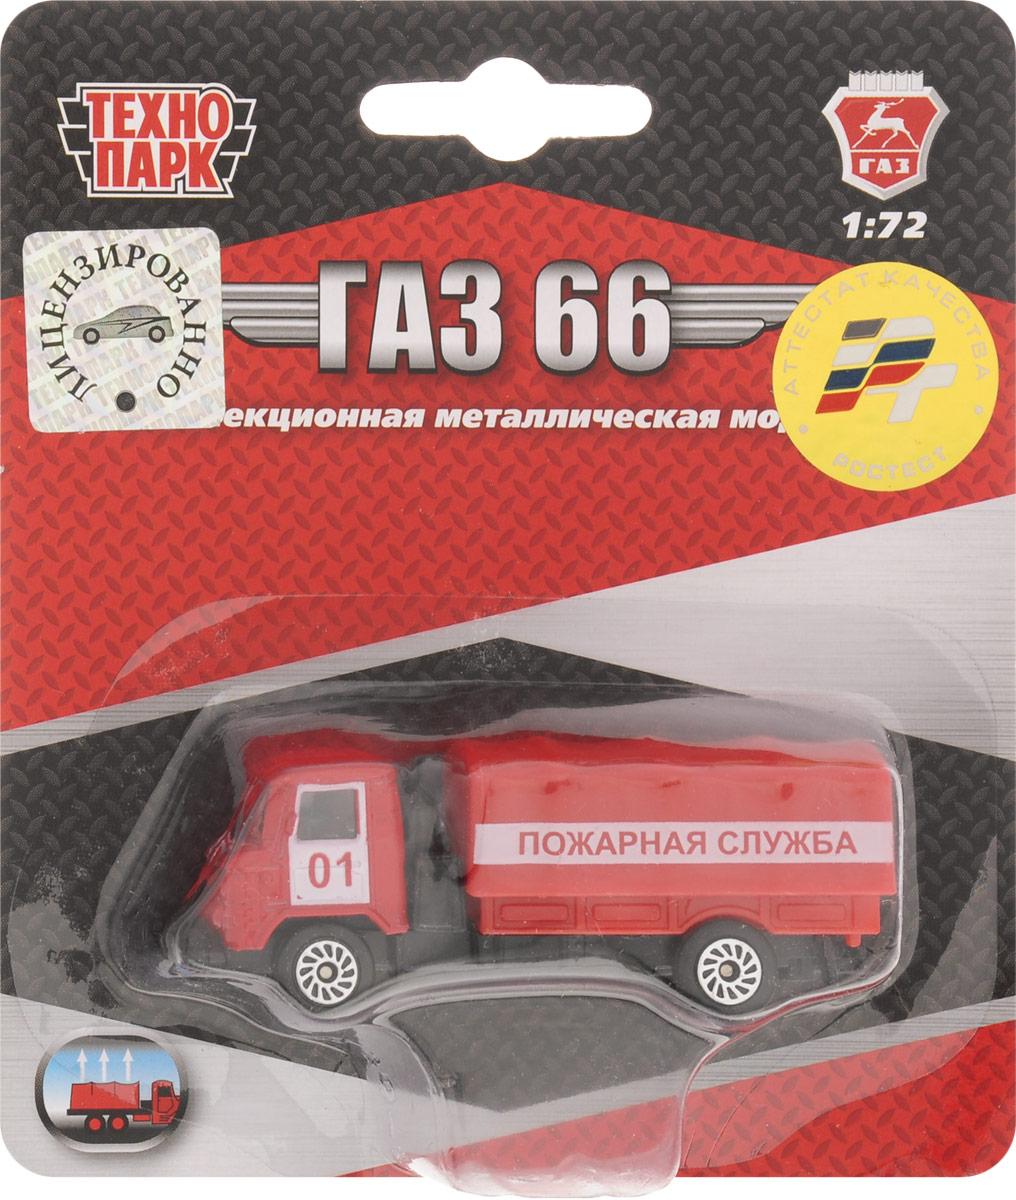 ТехноПарк Автомобиль ГАЗ 66 Пожарная служба технопарк газ 66 с пушкой